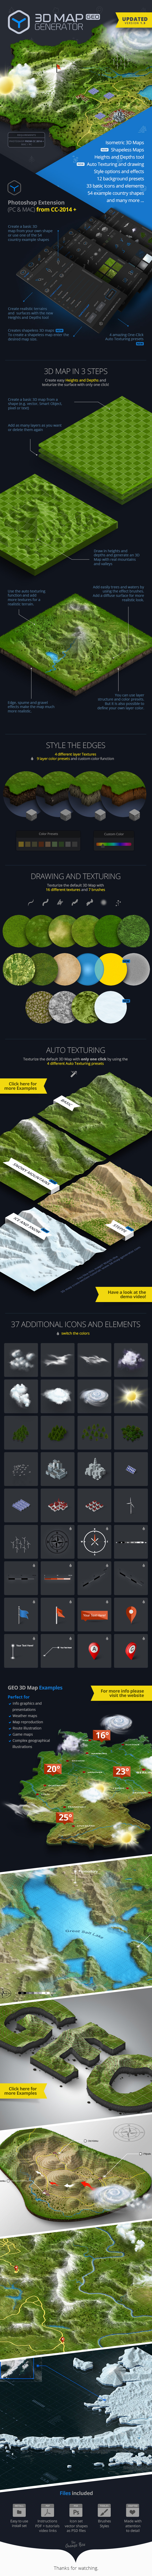 3D Map Generator - GEO(更新V1.54) 经典地图插件,推荐